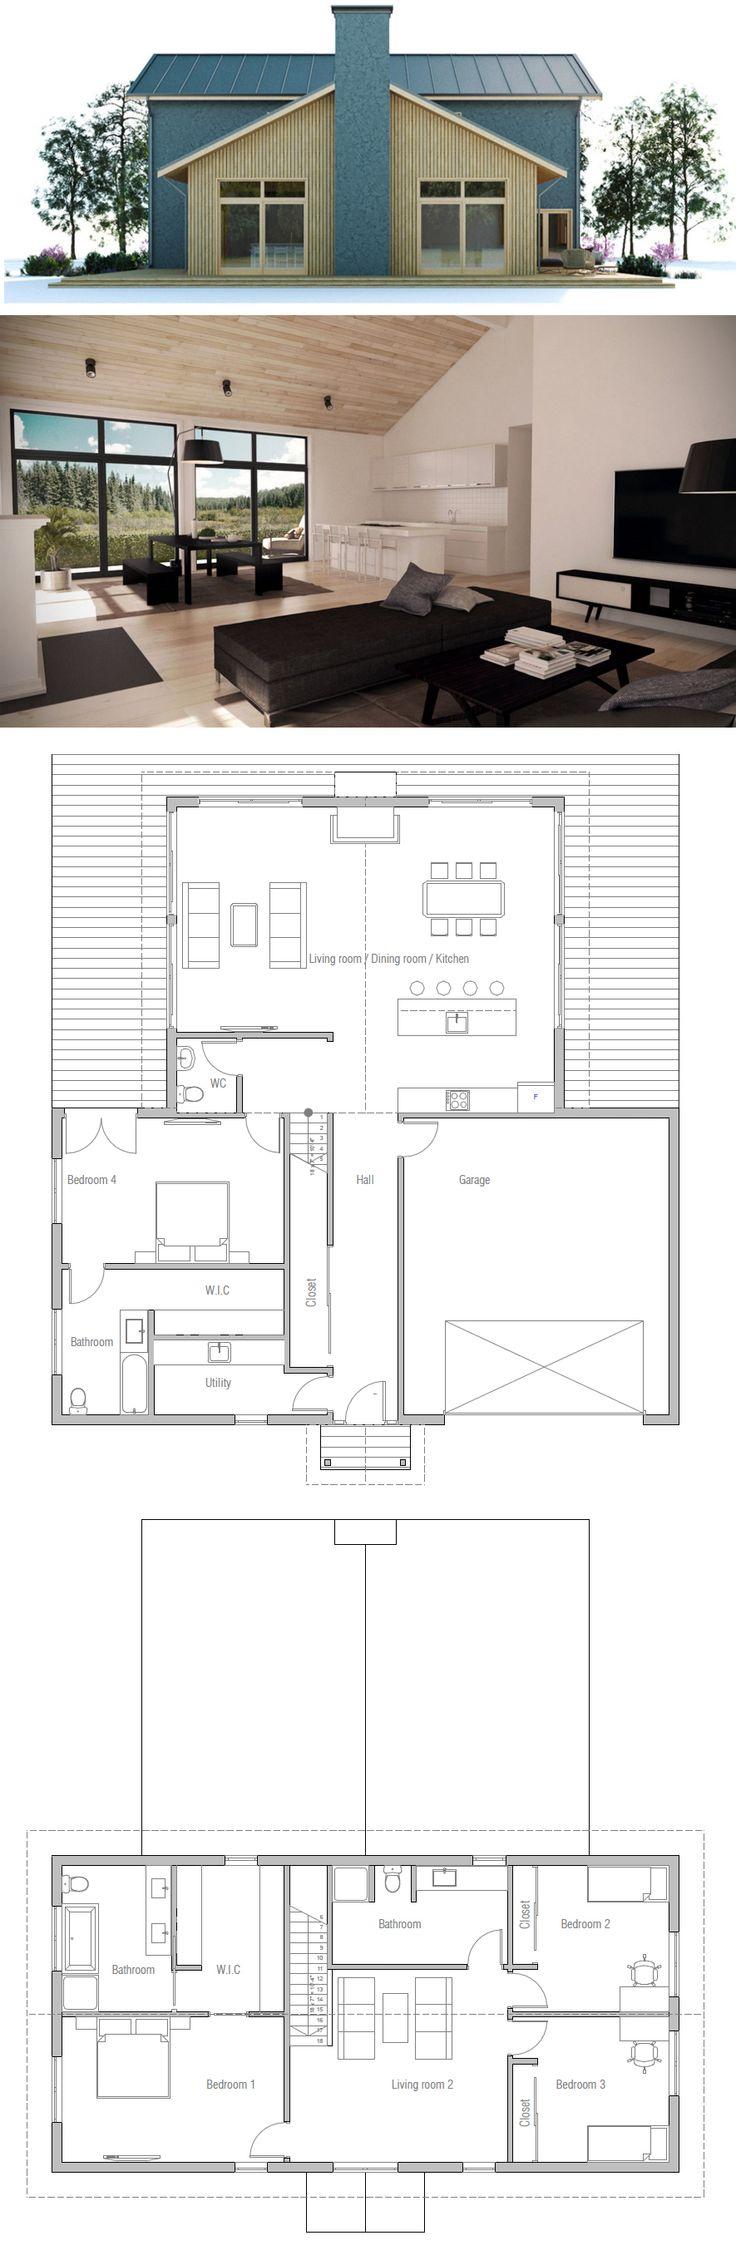 Bungalow Bauen   Haustypen ... size: 736 x 2260 post ID: 3 File size: 0 B